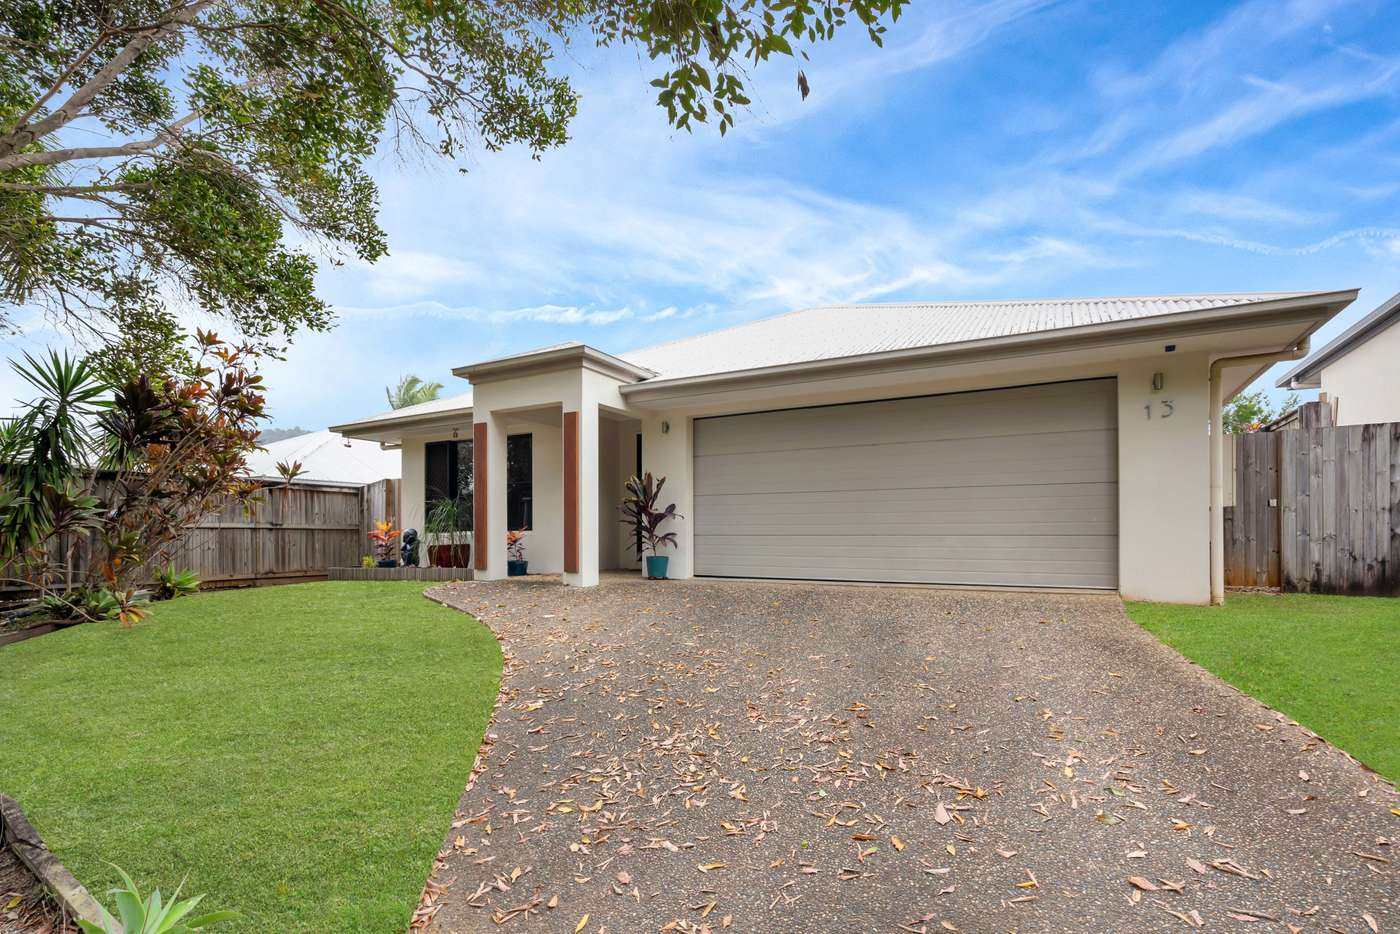 Main view of Homely house listing, 13 Catamaran Street, Trinity Beach QLD 4879